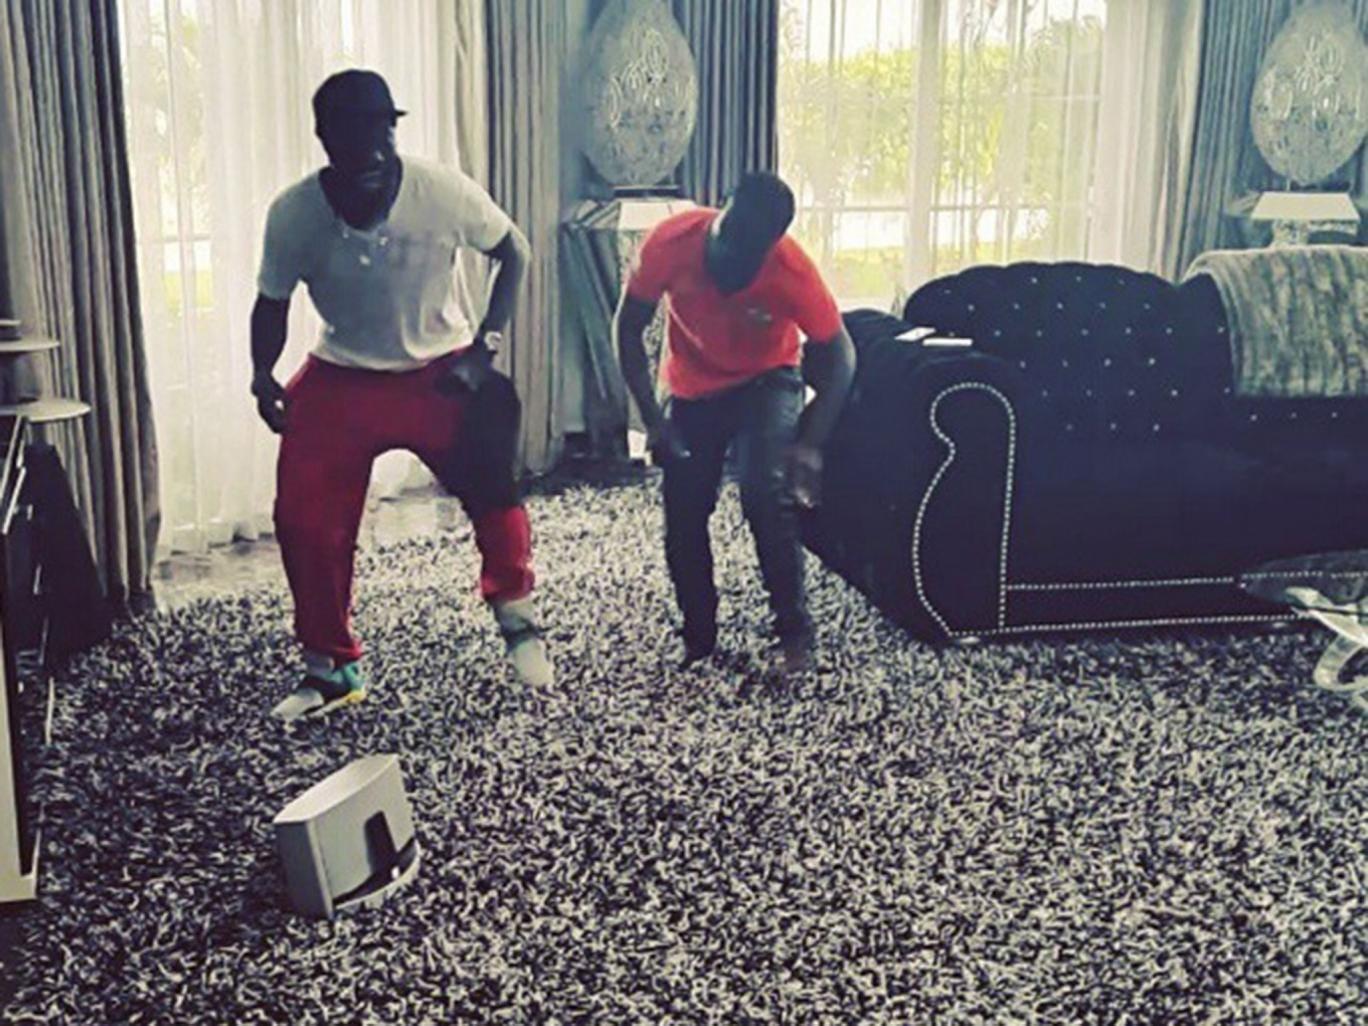 Emmanuel Adebayor and his new dance moves